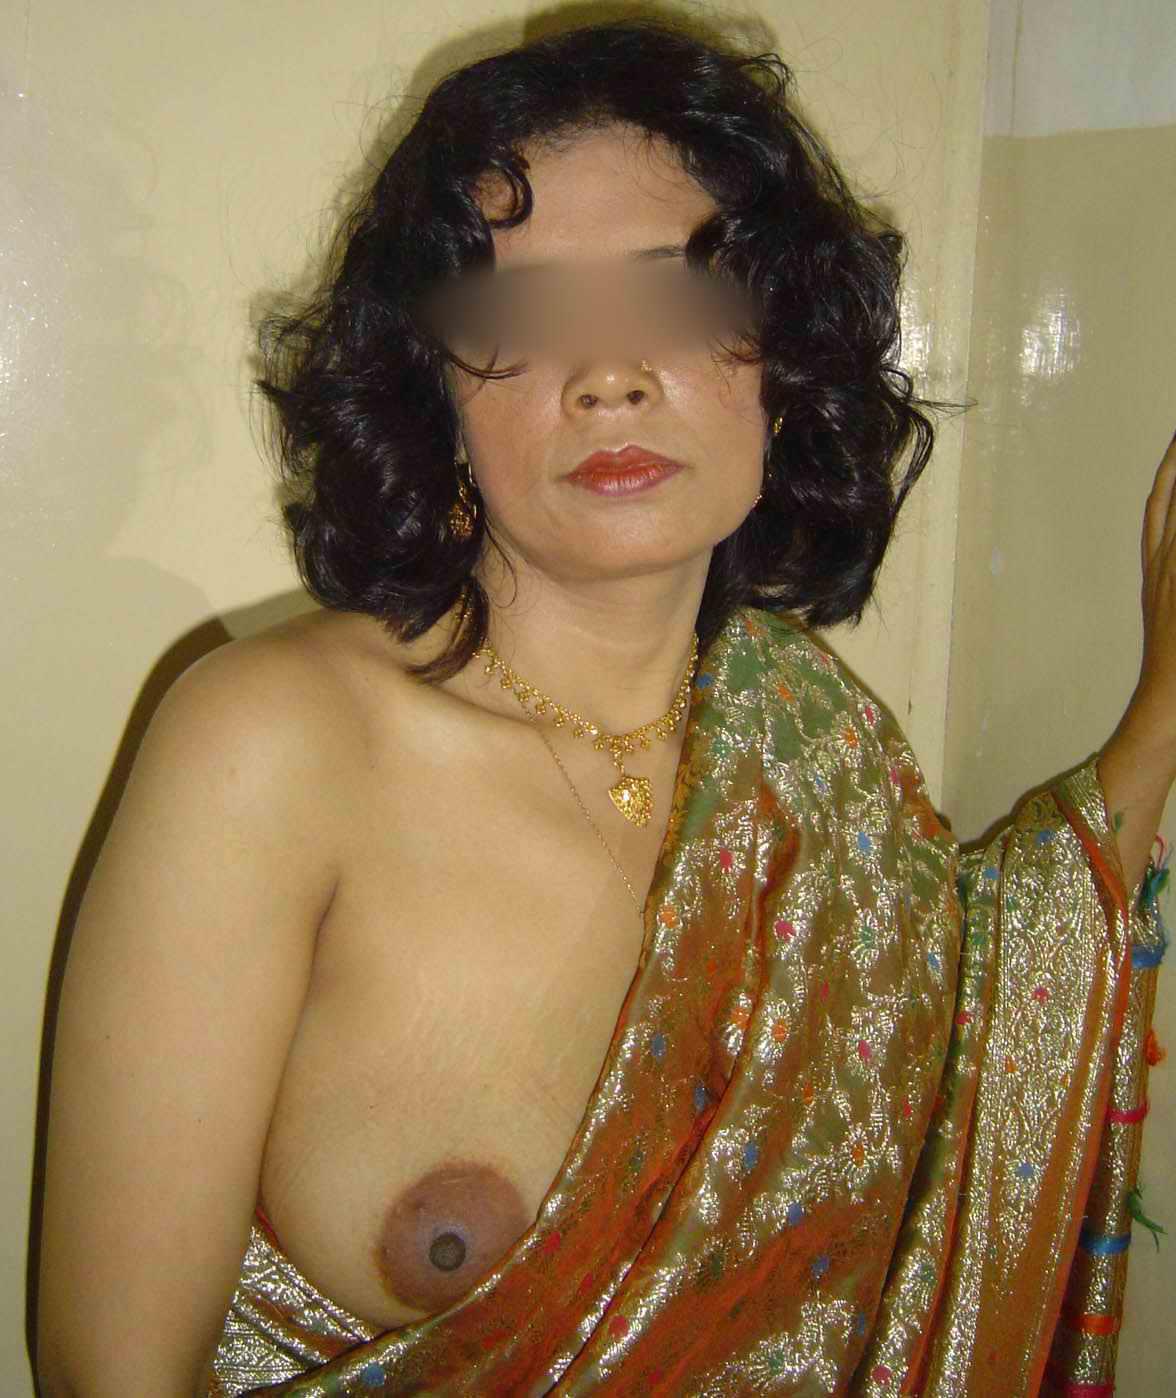 Desi papa mom indian Search -